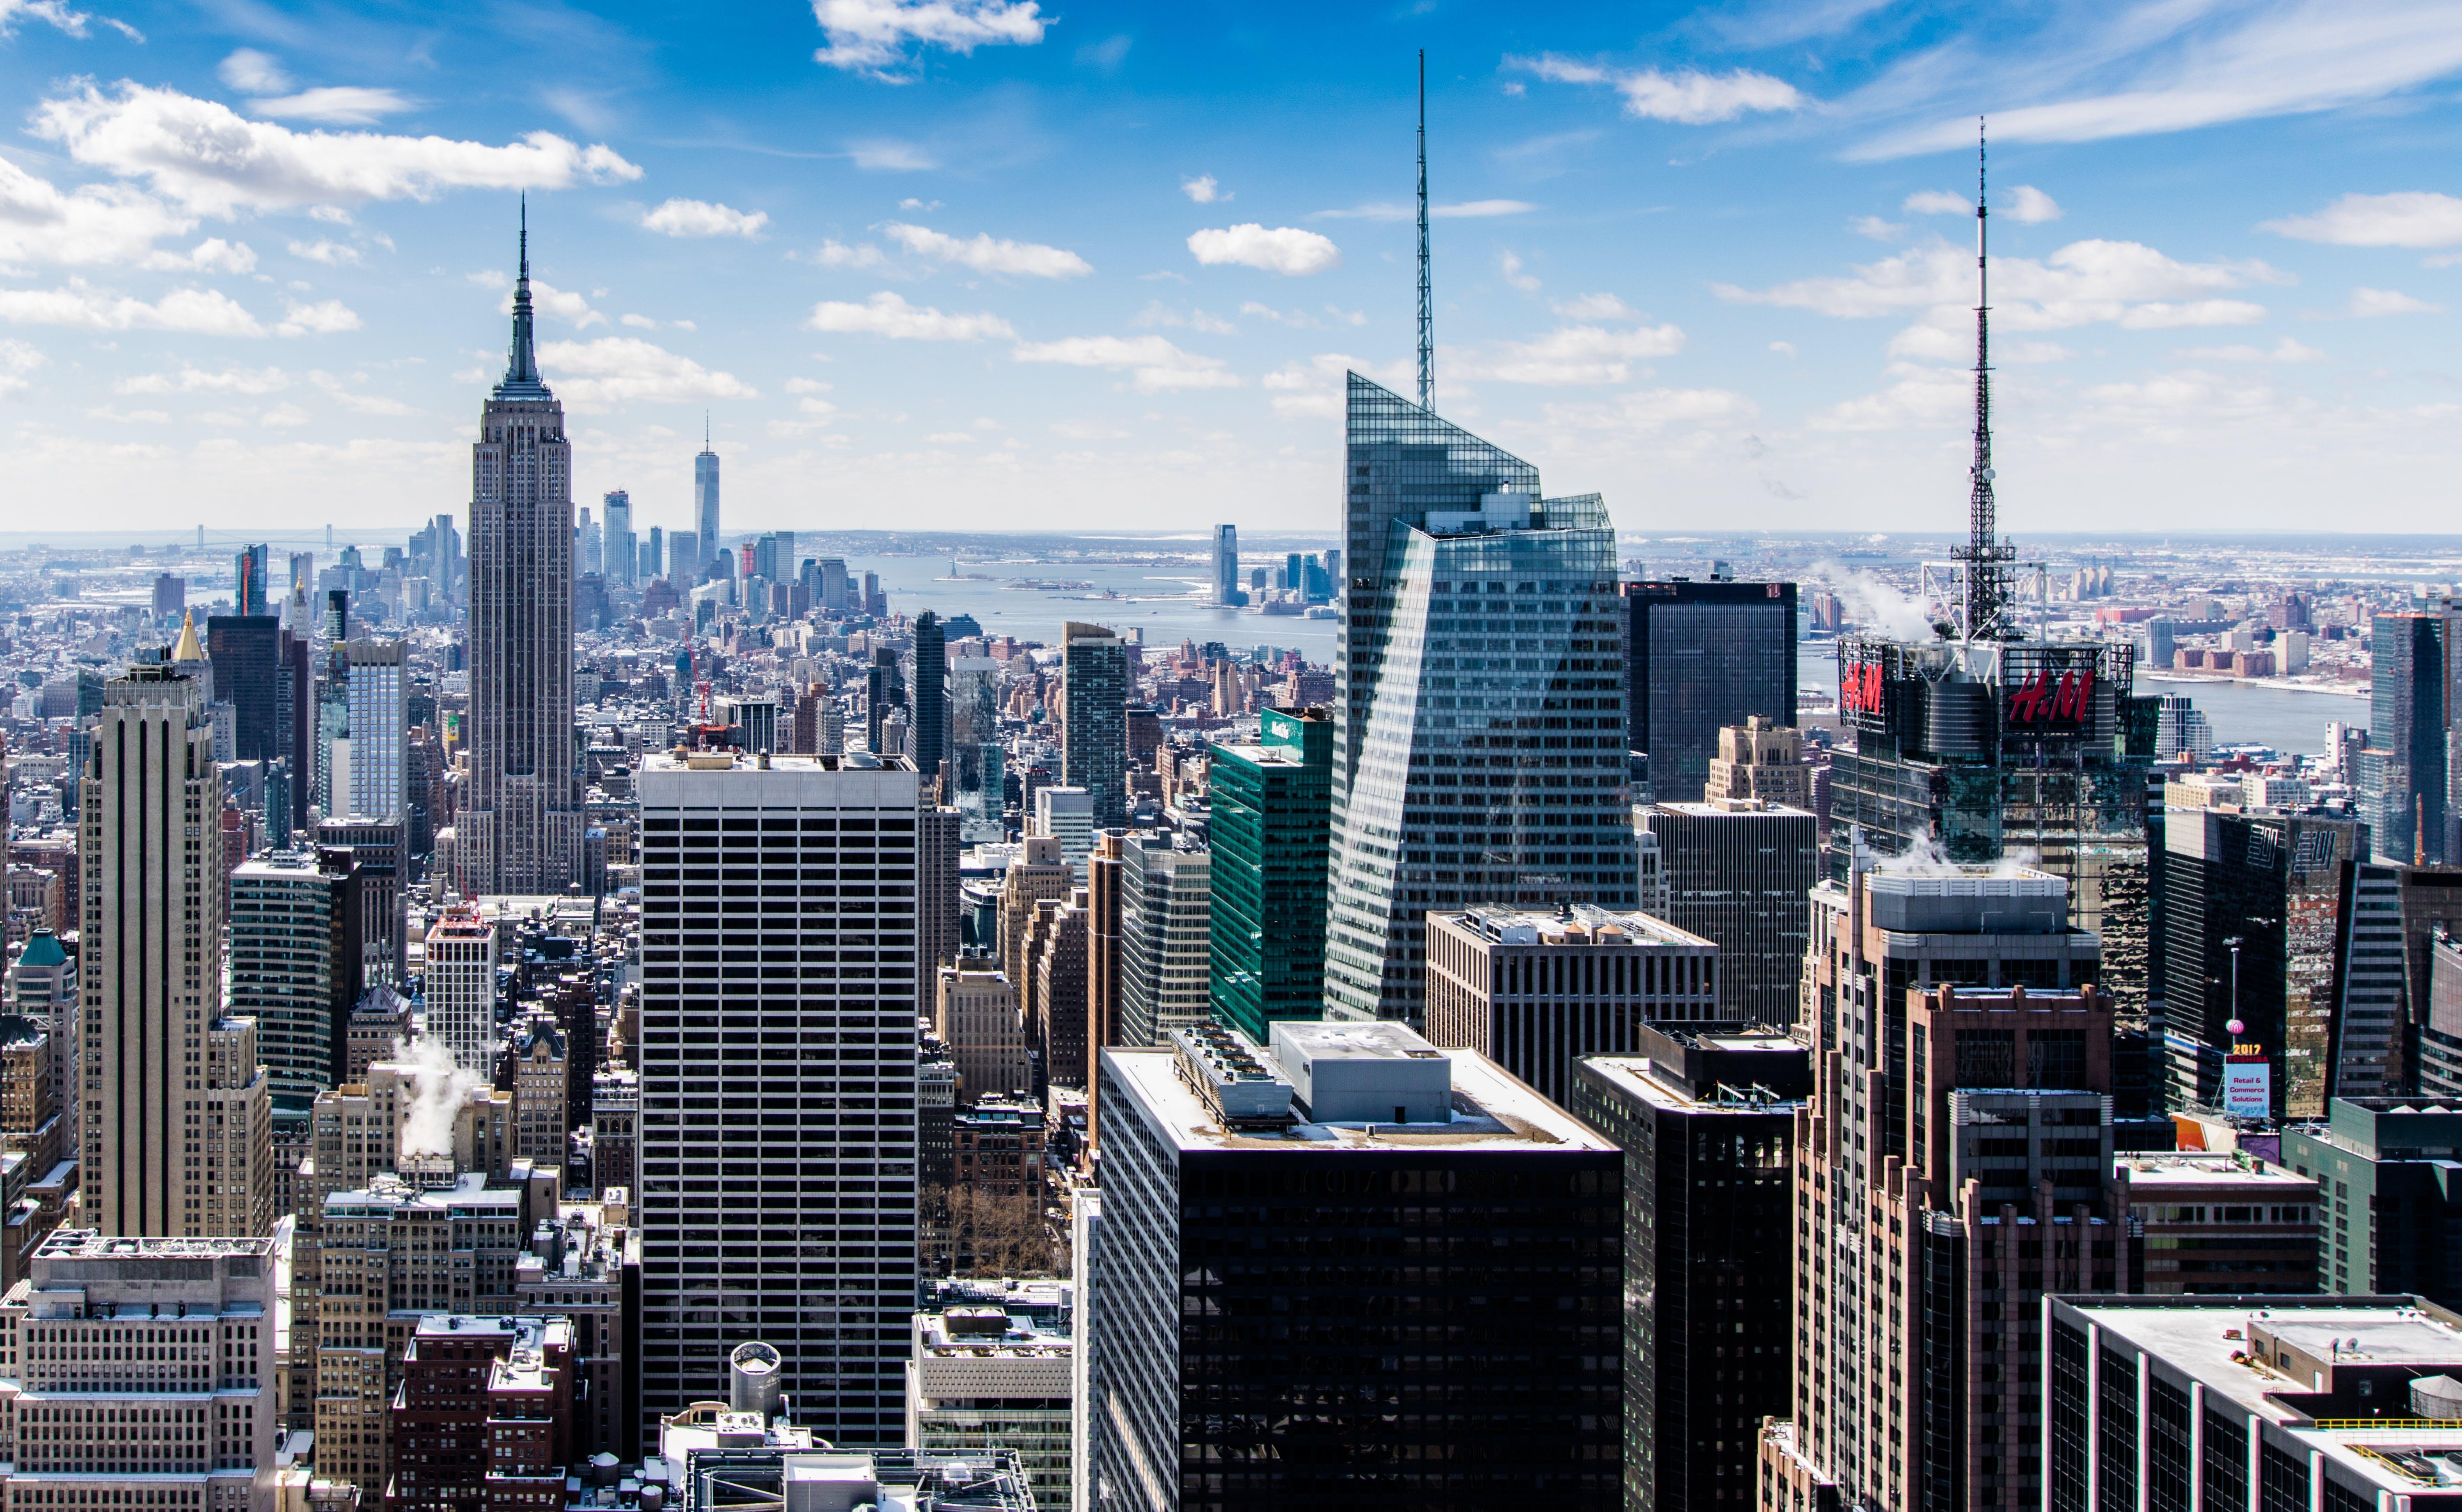 Birds Eye Photography of High-rise Building City